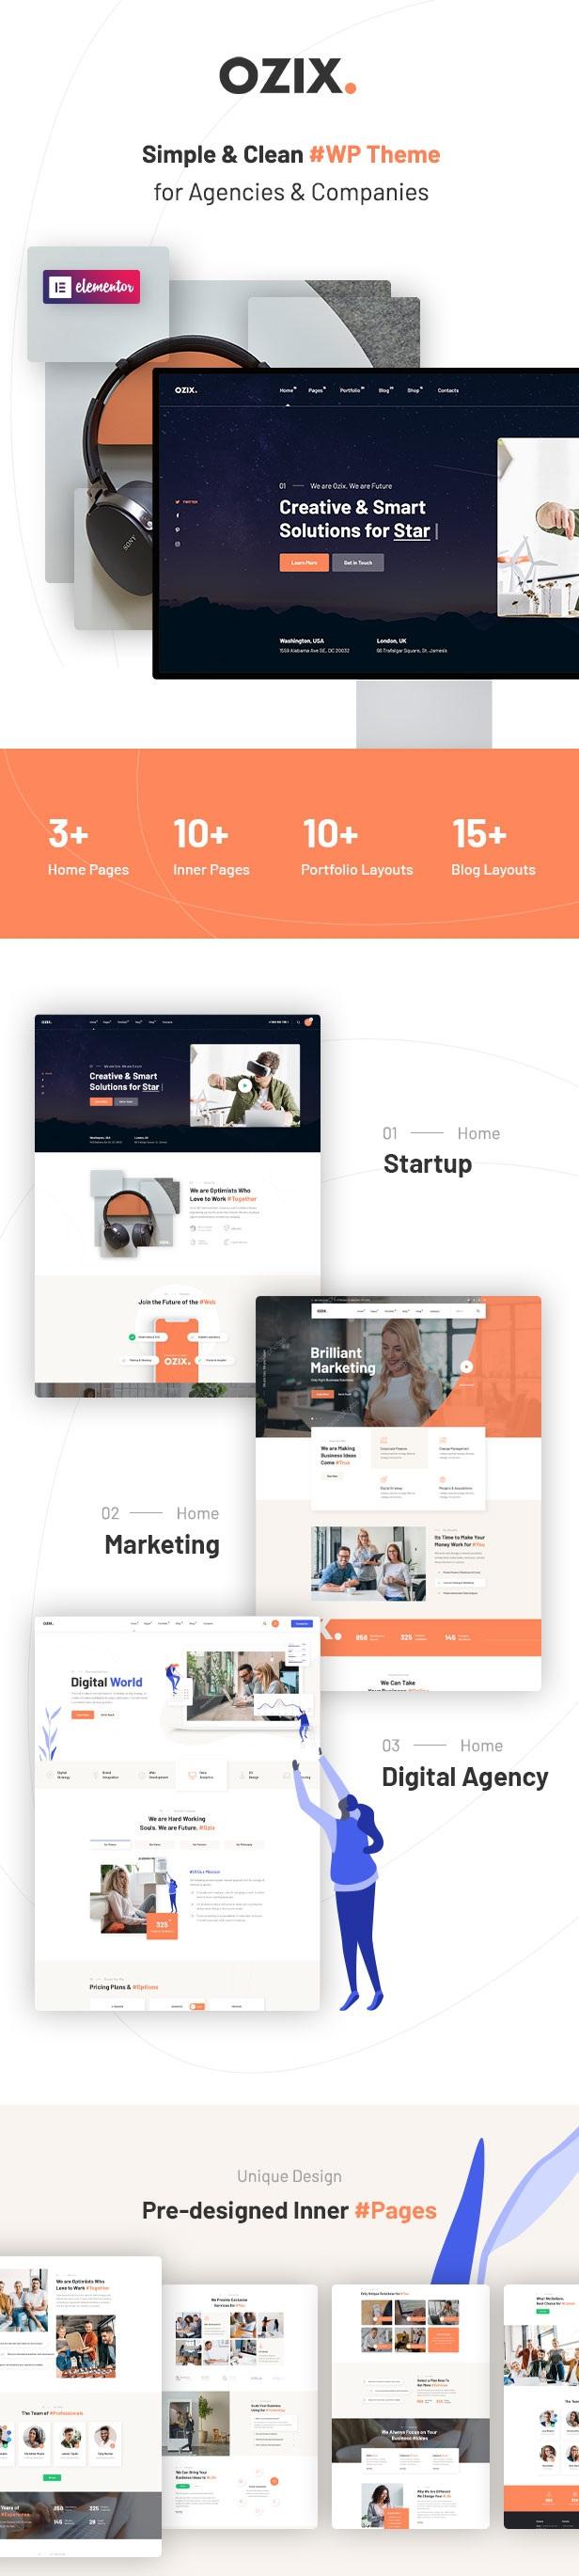 Agencies and Companies WordPress Theme